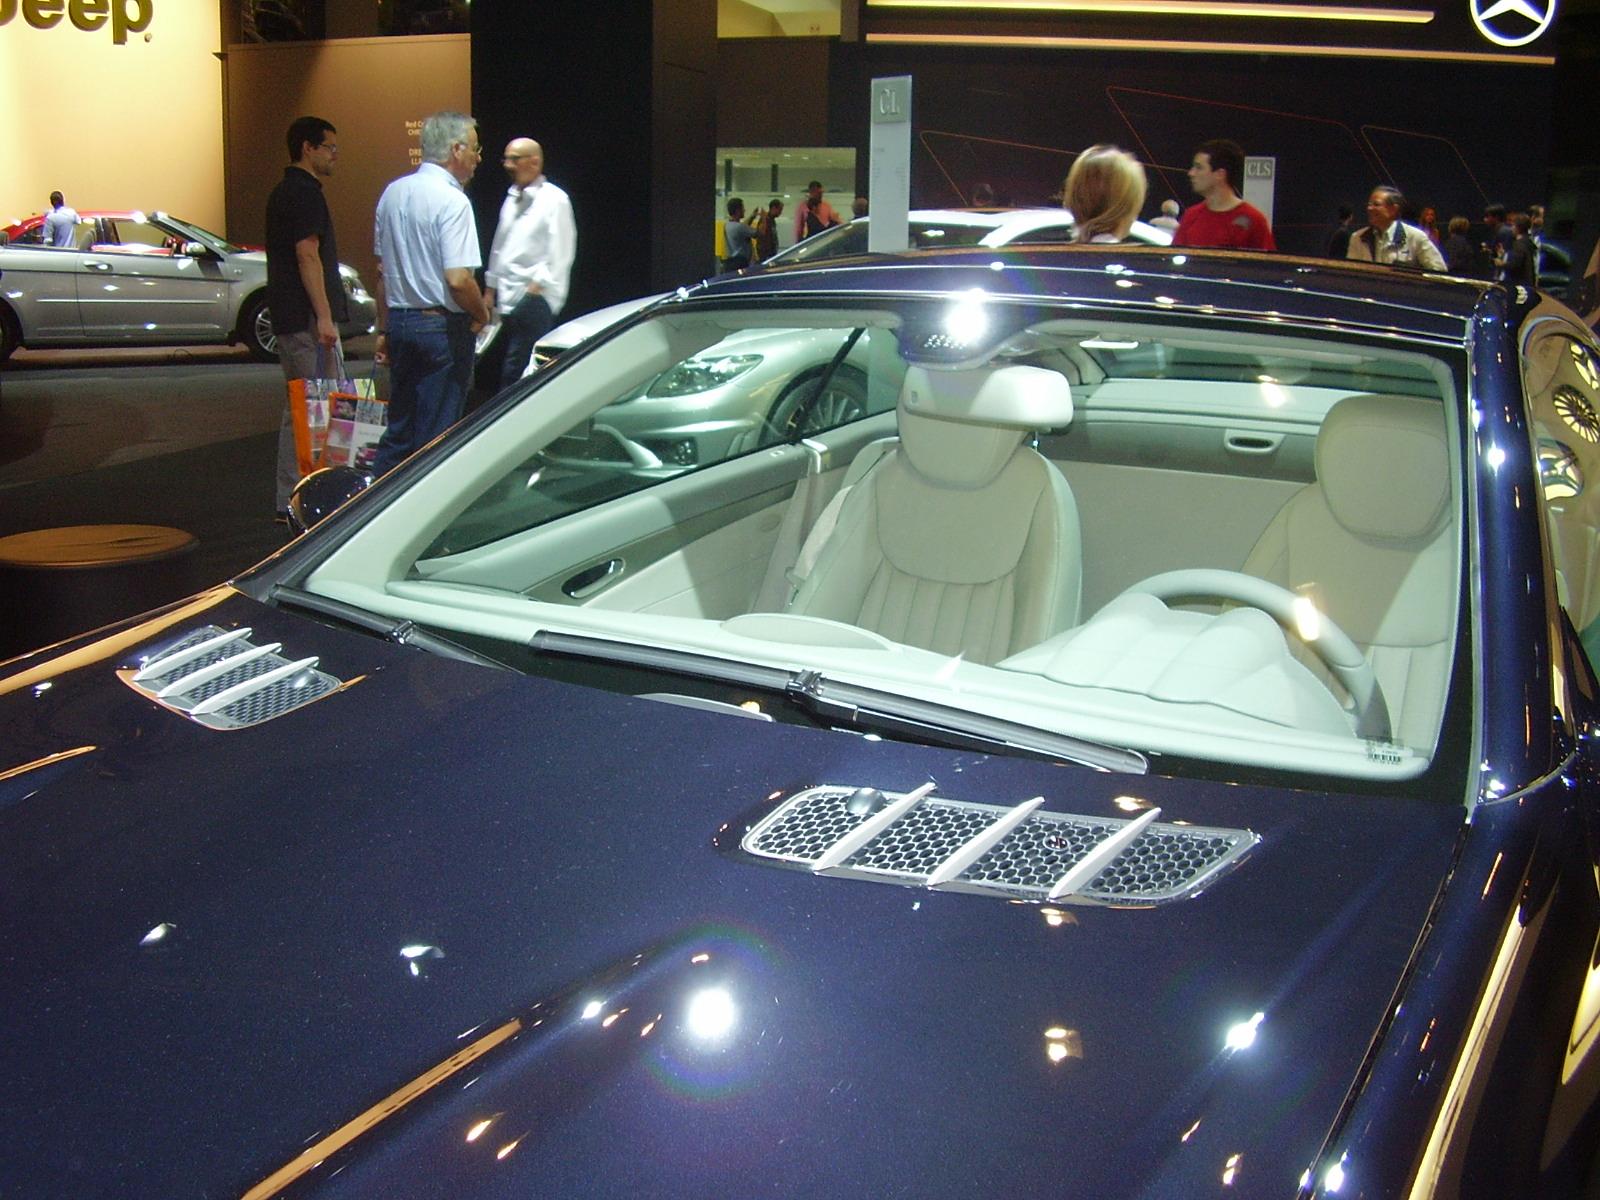 Visita Salon Automovil 09 BCN / Visit to Car Exhibition 09 Barcelona-P5140719.JPG